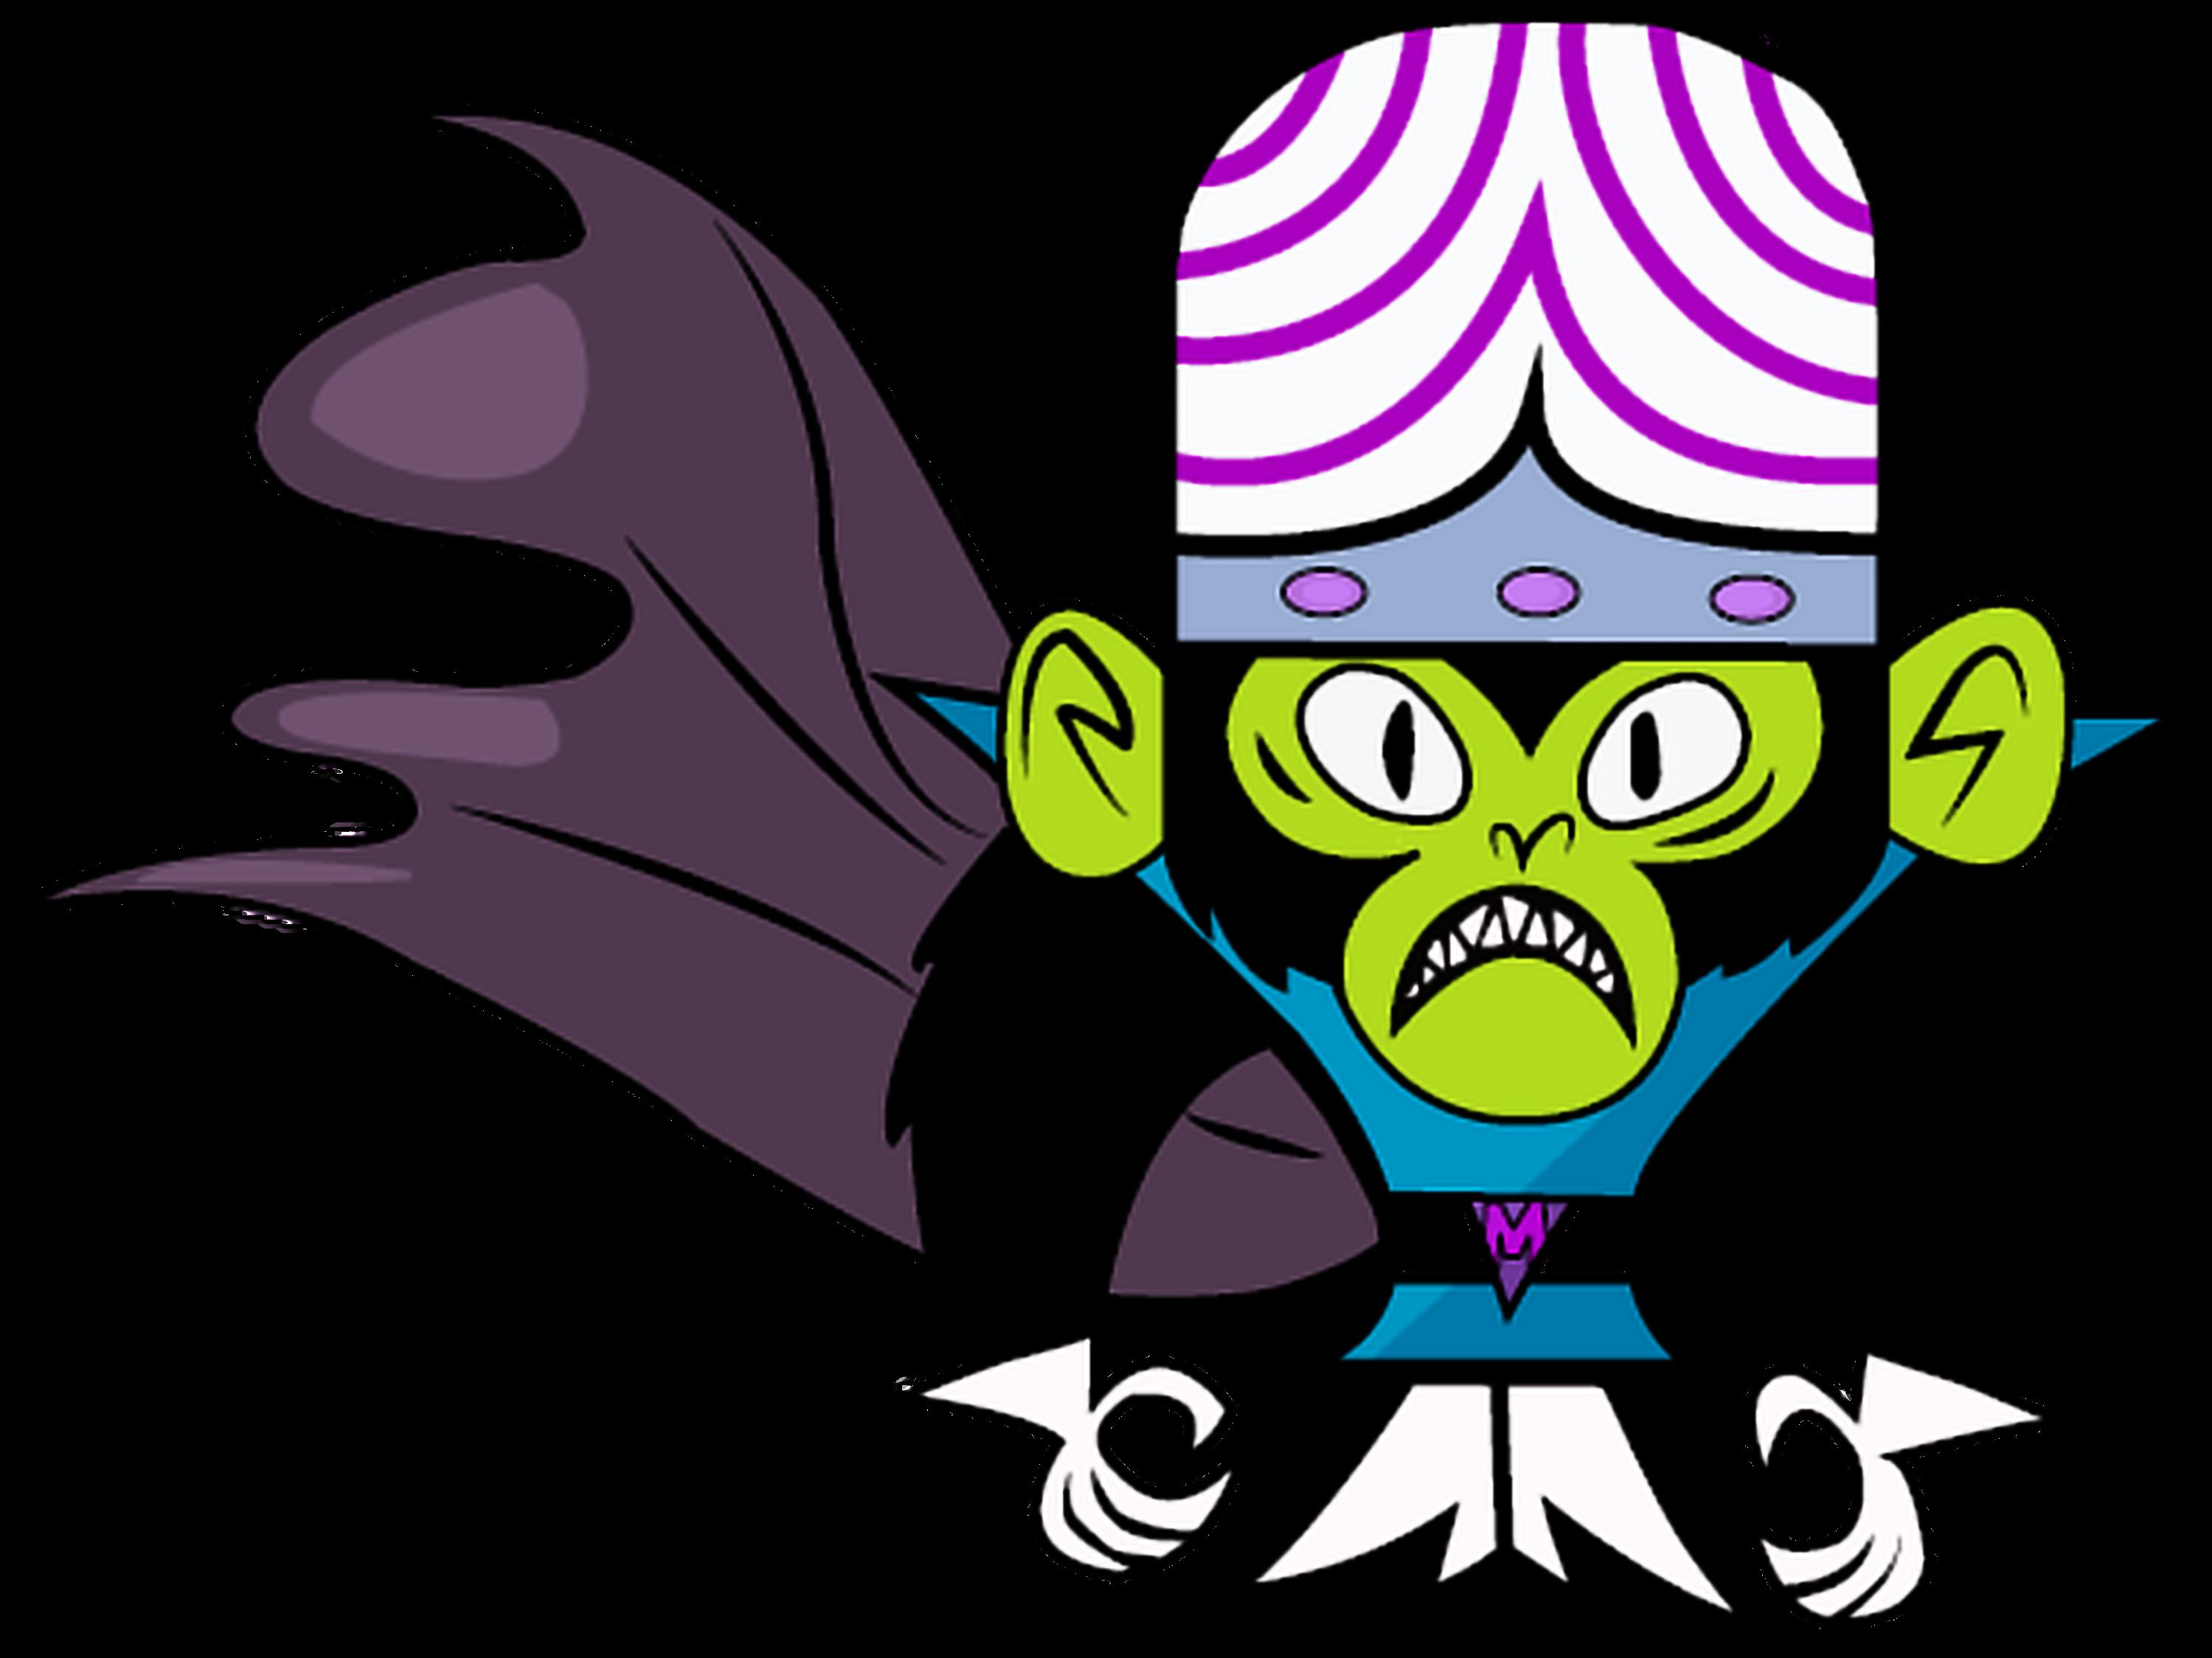 Mojo Jojo Villains Wiki Fandom Powered By Wikia Mojo Jojo Powerpuff Girls Villains Mojo Jojo Costume